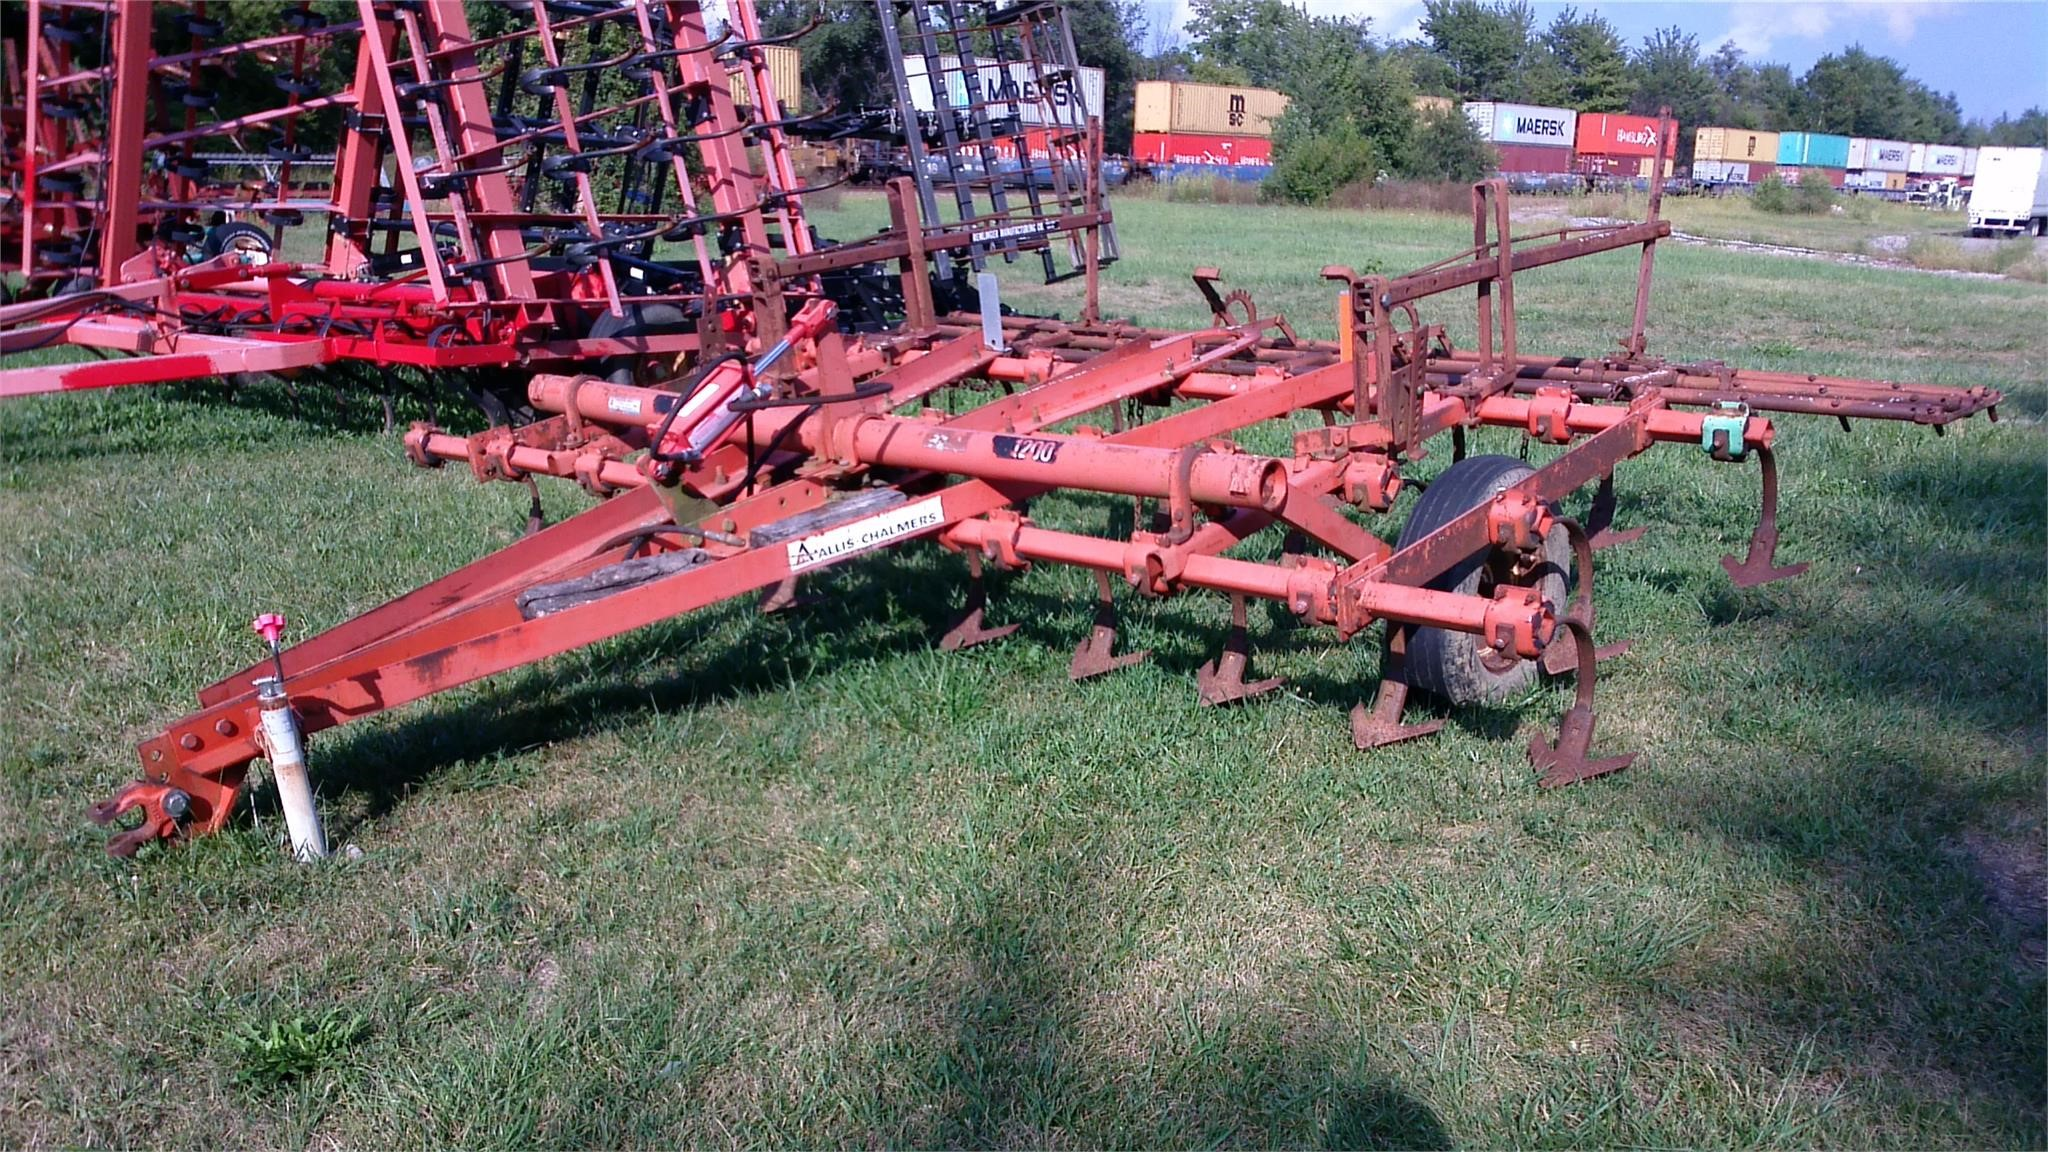 1980 Allis Chalmers 1200 Field Cultivator